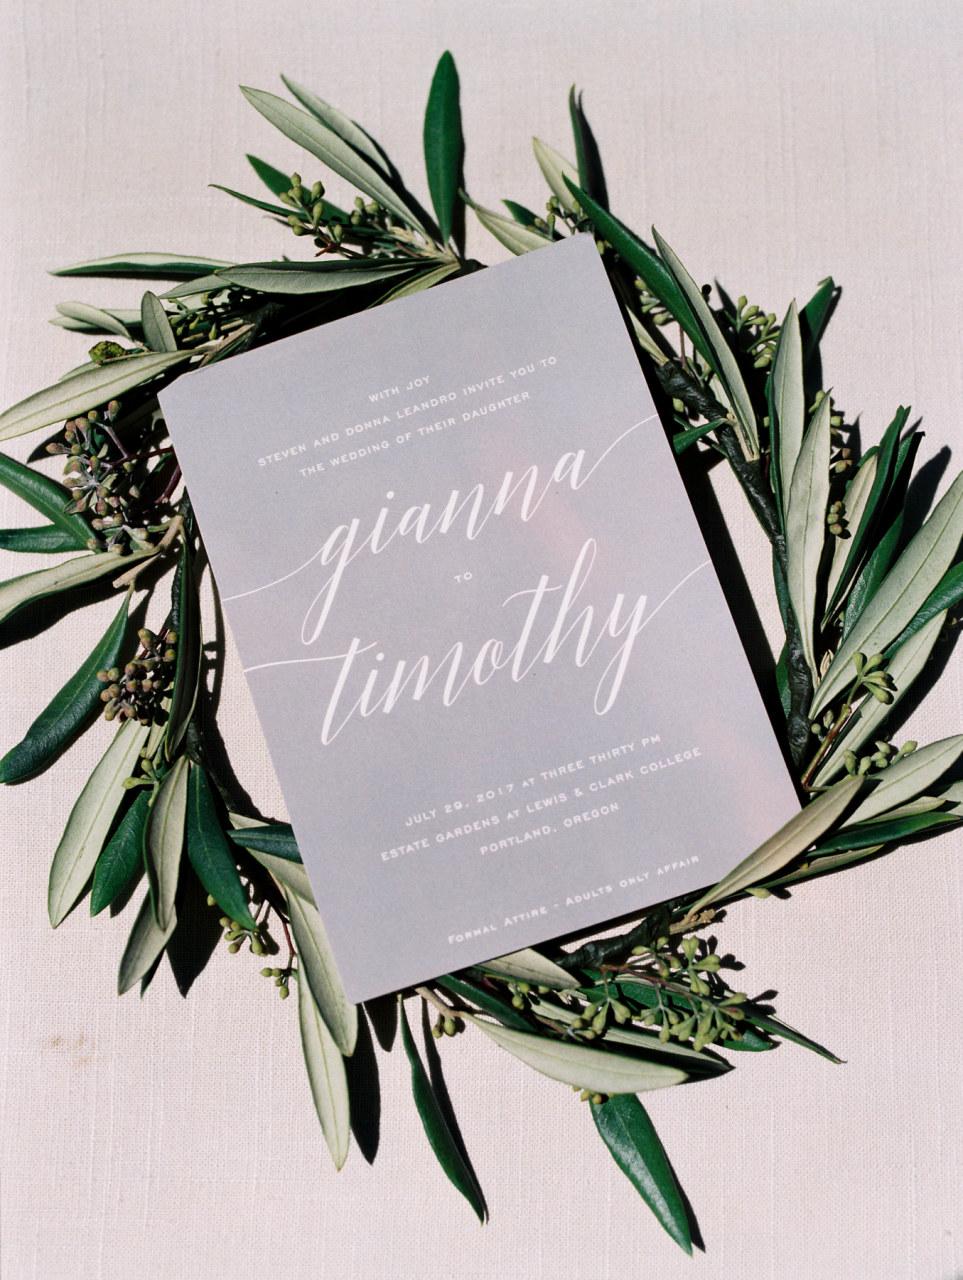 fine-art-wedding-florist-foraged-floral-lewis-and-clark-college-wedding-greenery-crowns.jpg